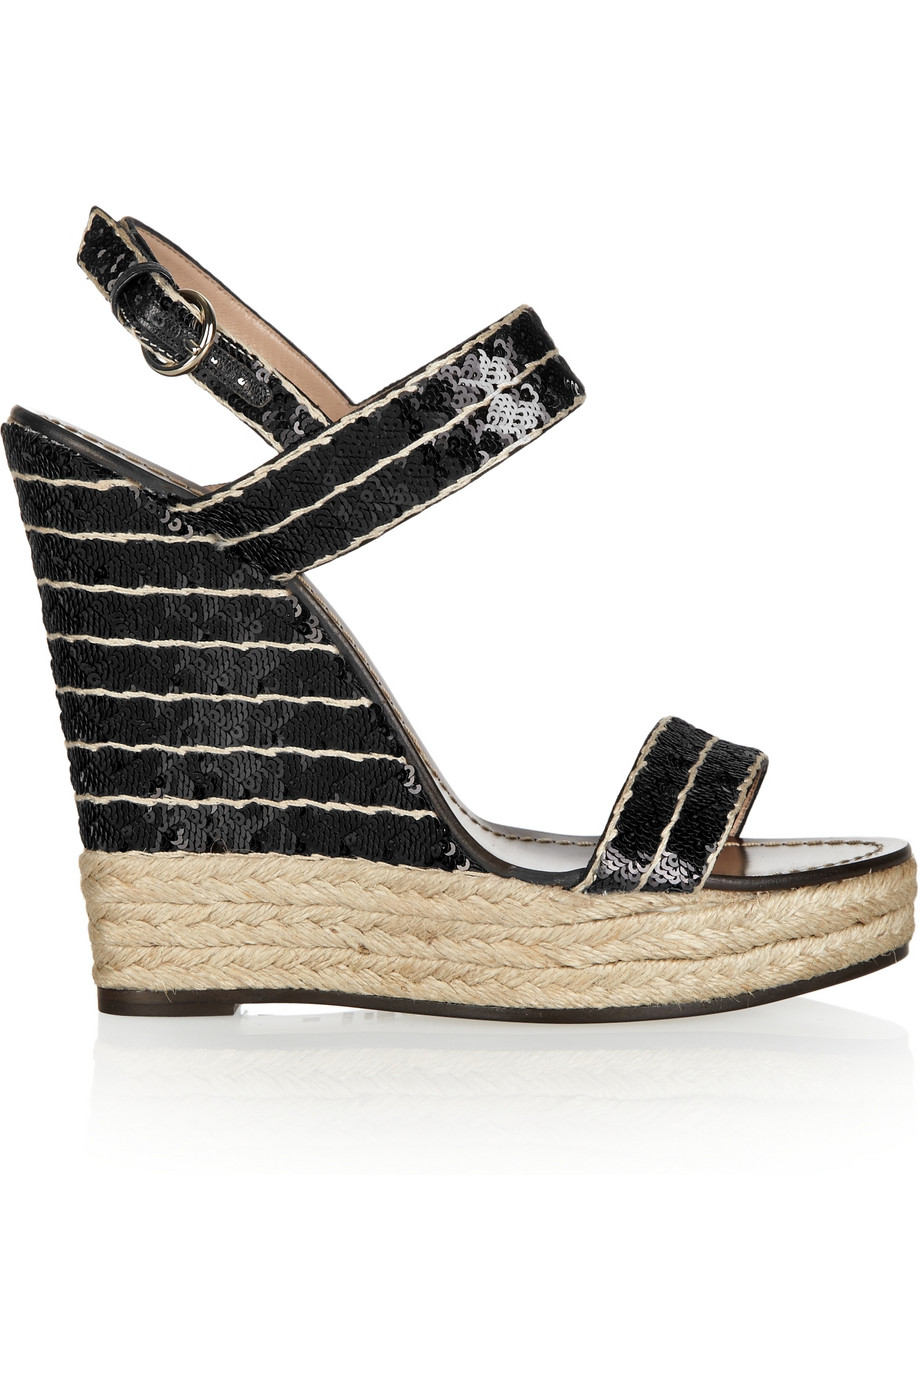 95b36823161 Lyst - Valentino Sequined Espadrille Wedge Sandals in Black